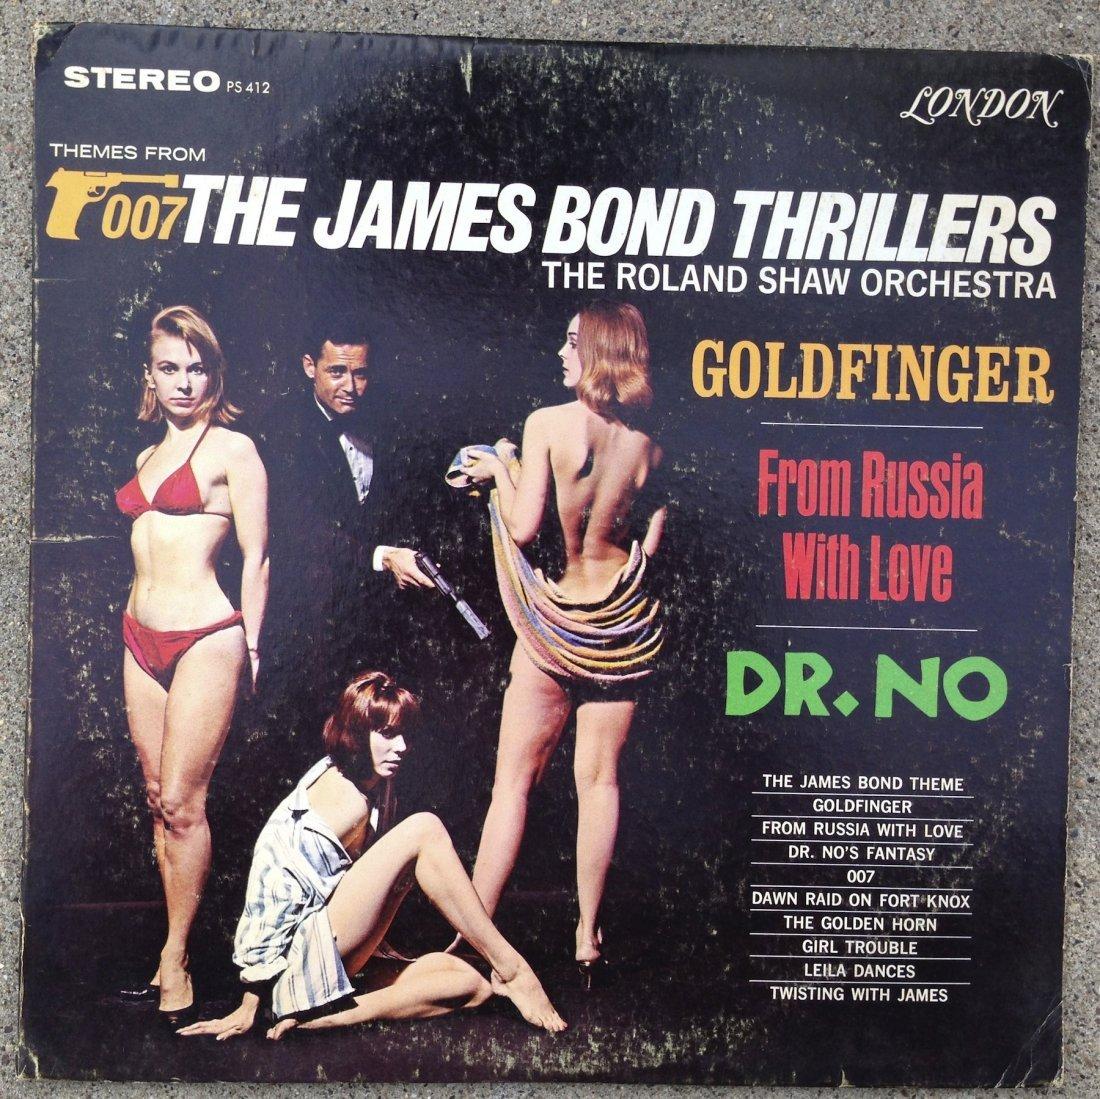 007 THE JAMES BOND THRILLERS - ROLAND SHAW